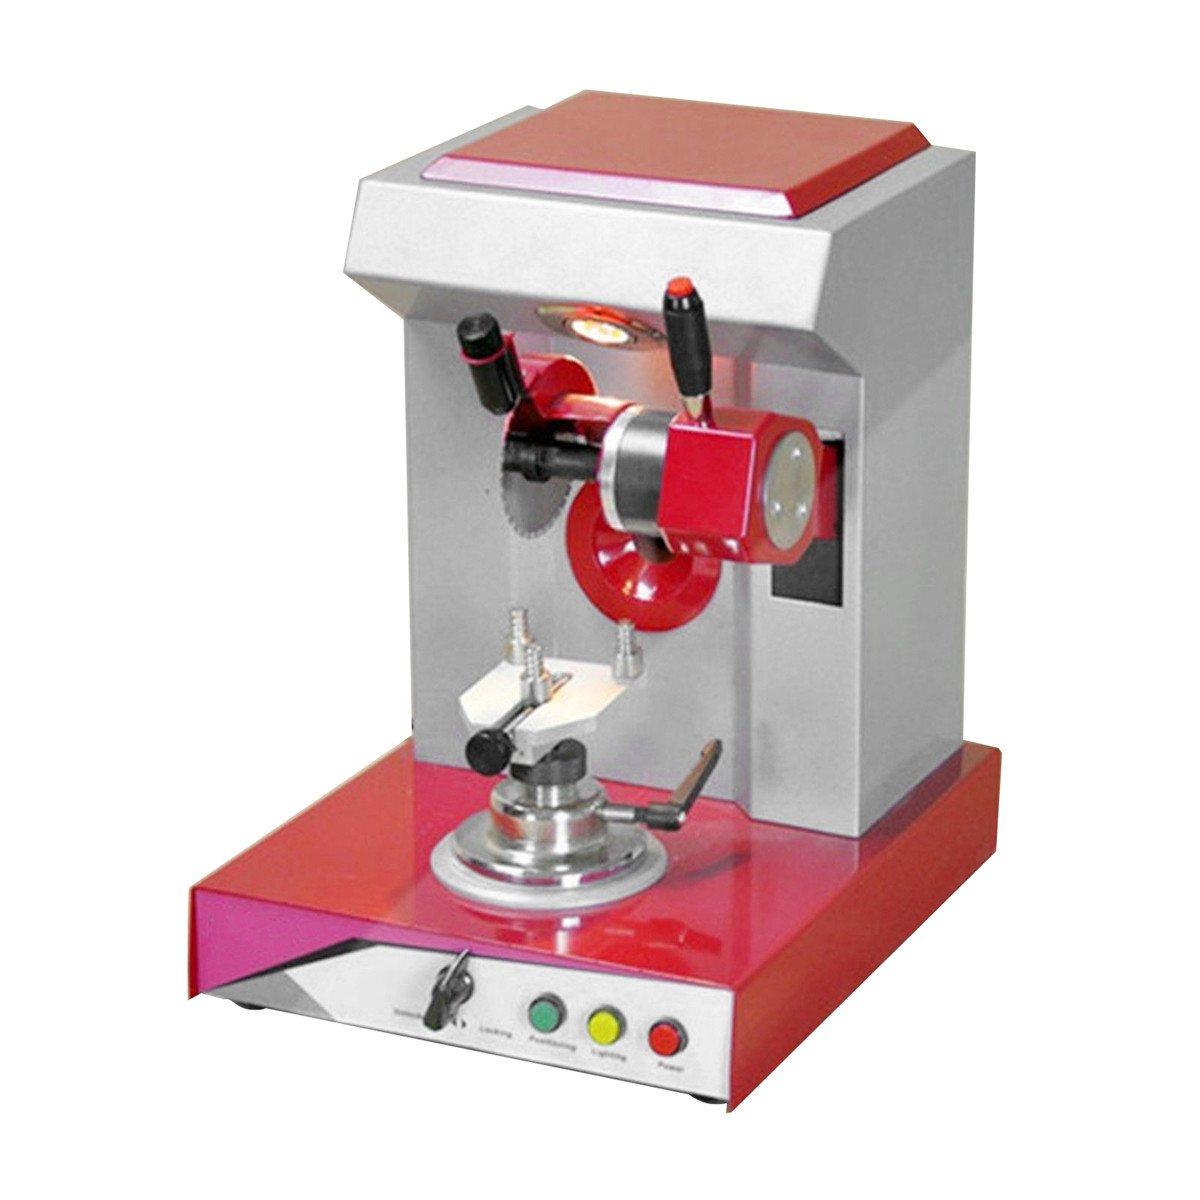 Dental Lab Die Separating Unit Plaster Cutting Machine 3500RPM 110V